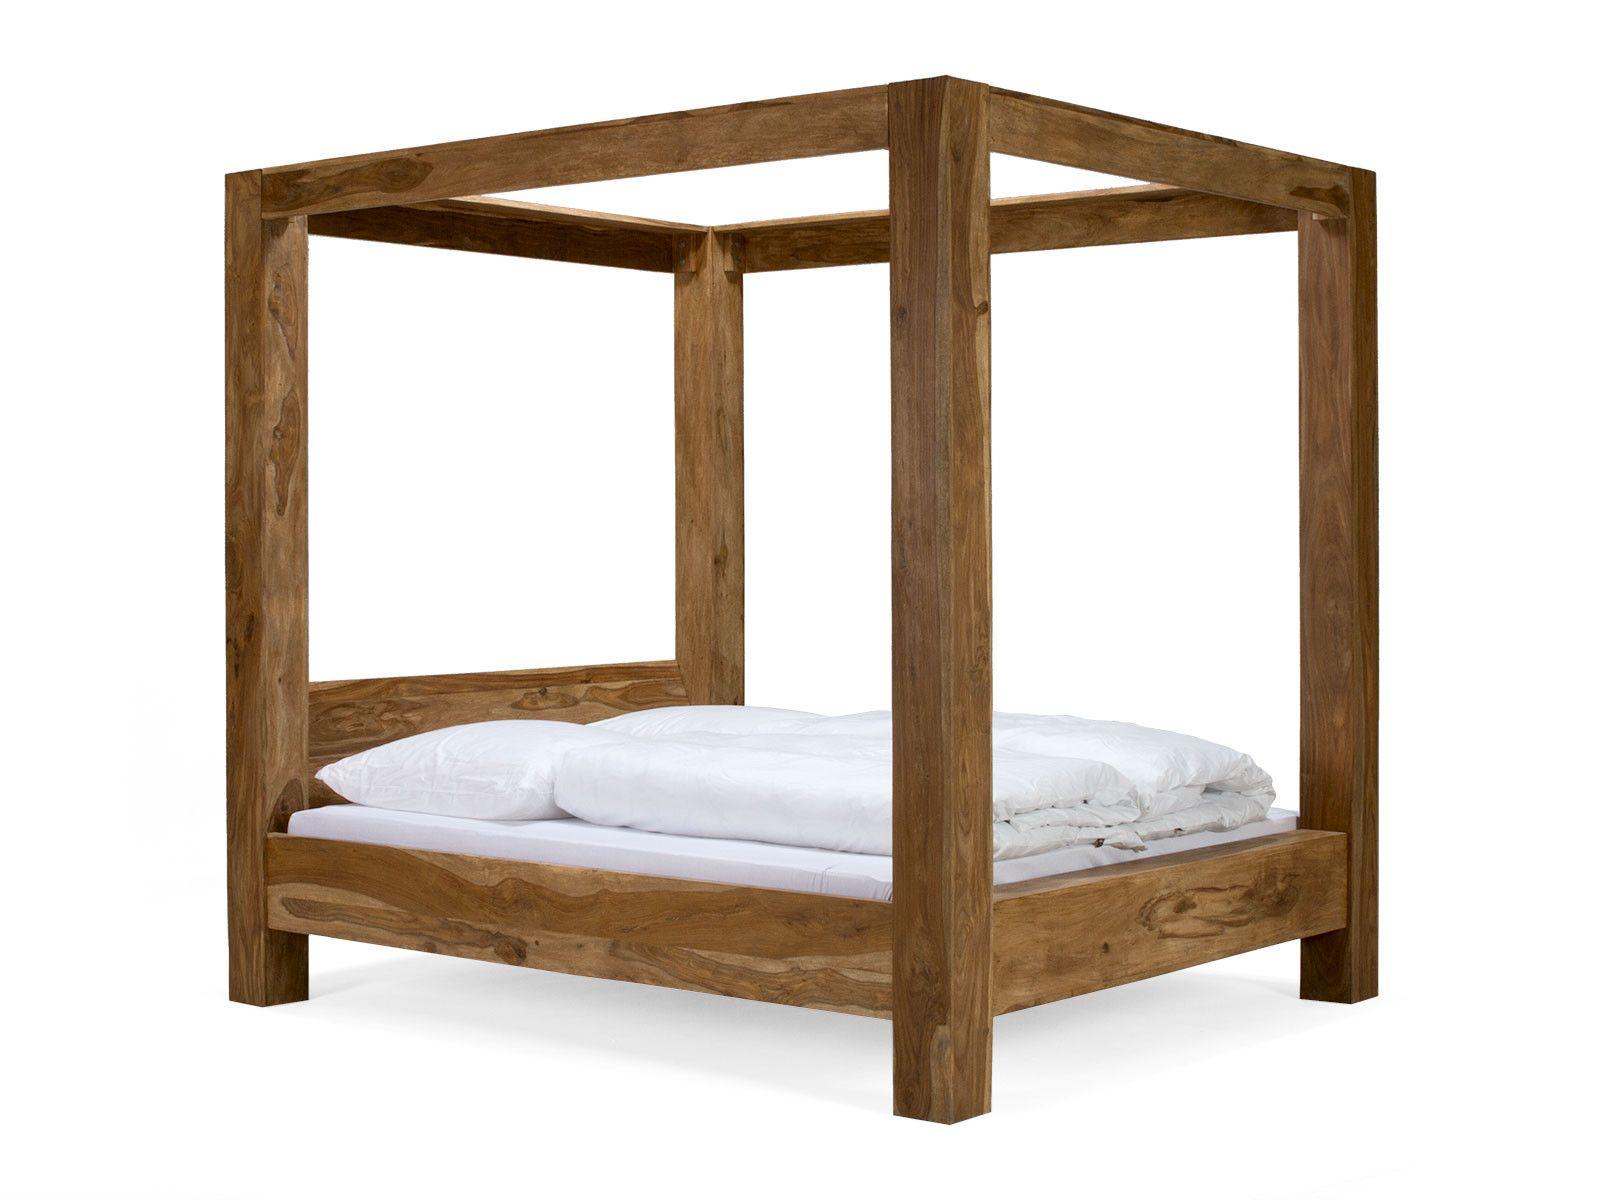 die besten 25 holzbett 180x200 ideen auf pinterest bett 180x200 holz bett holz und. Black Bedroom Furniture Sets. Home Design Ideas